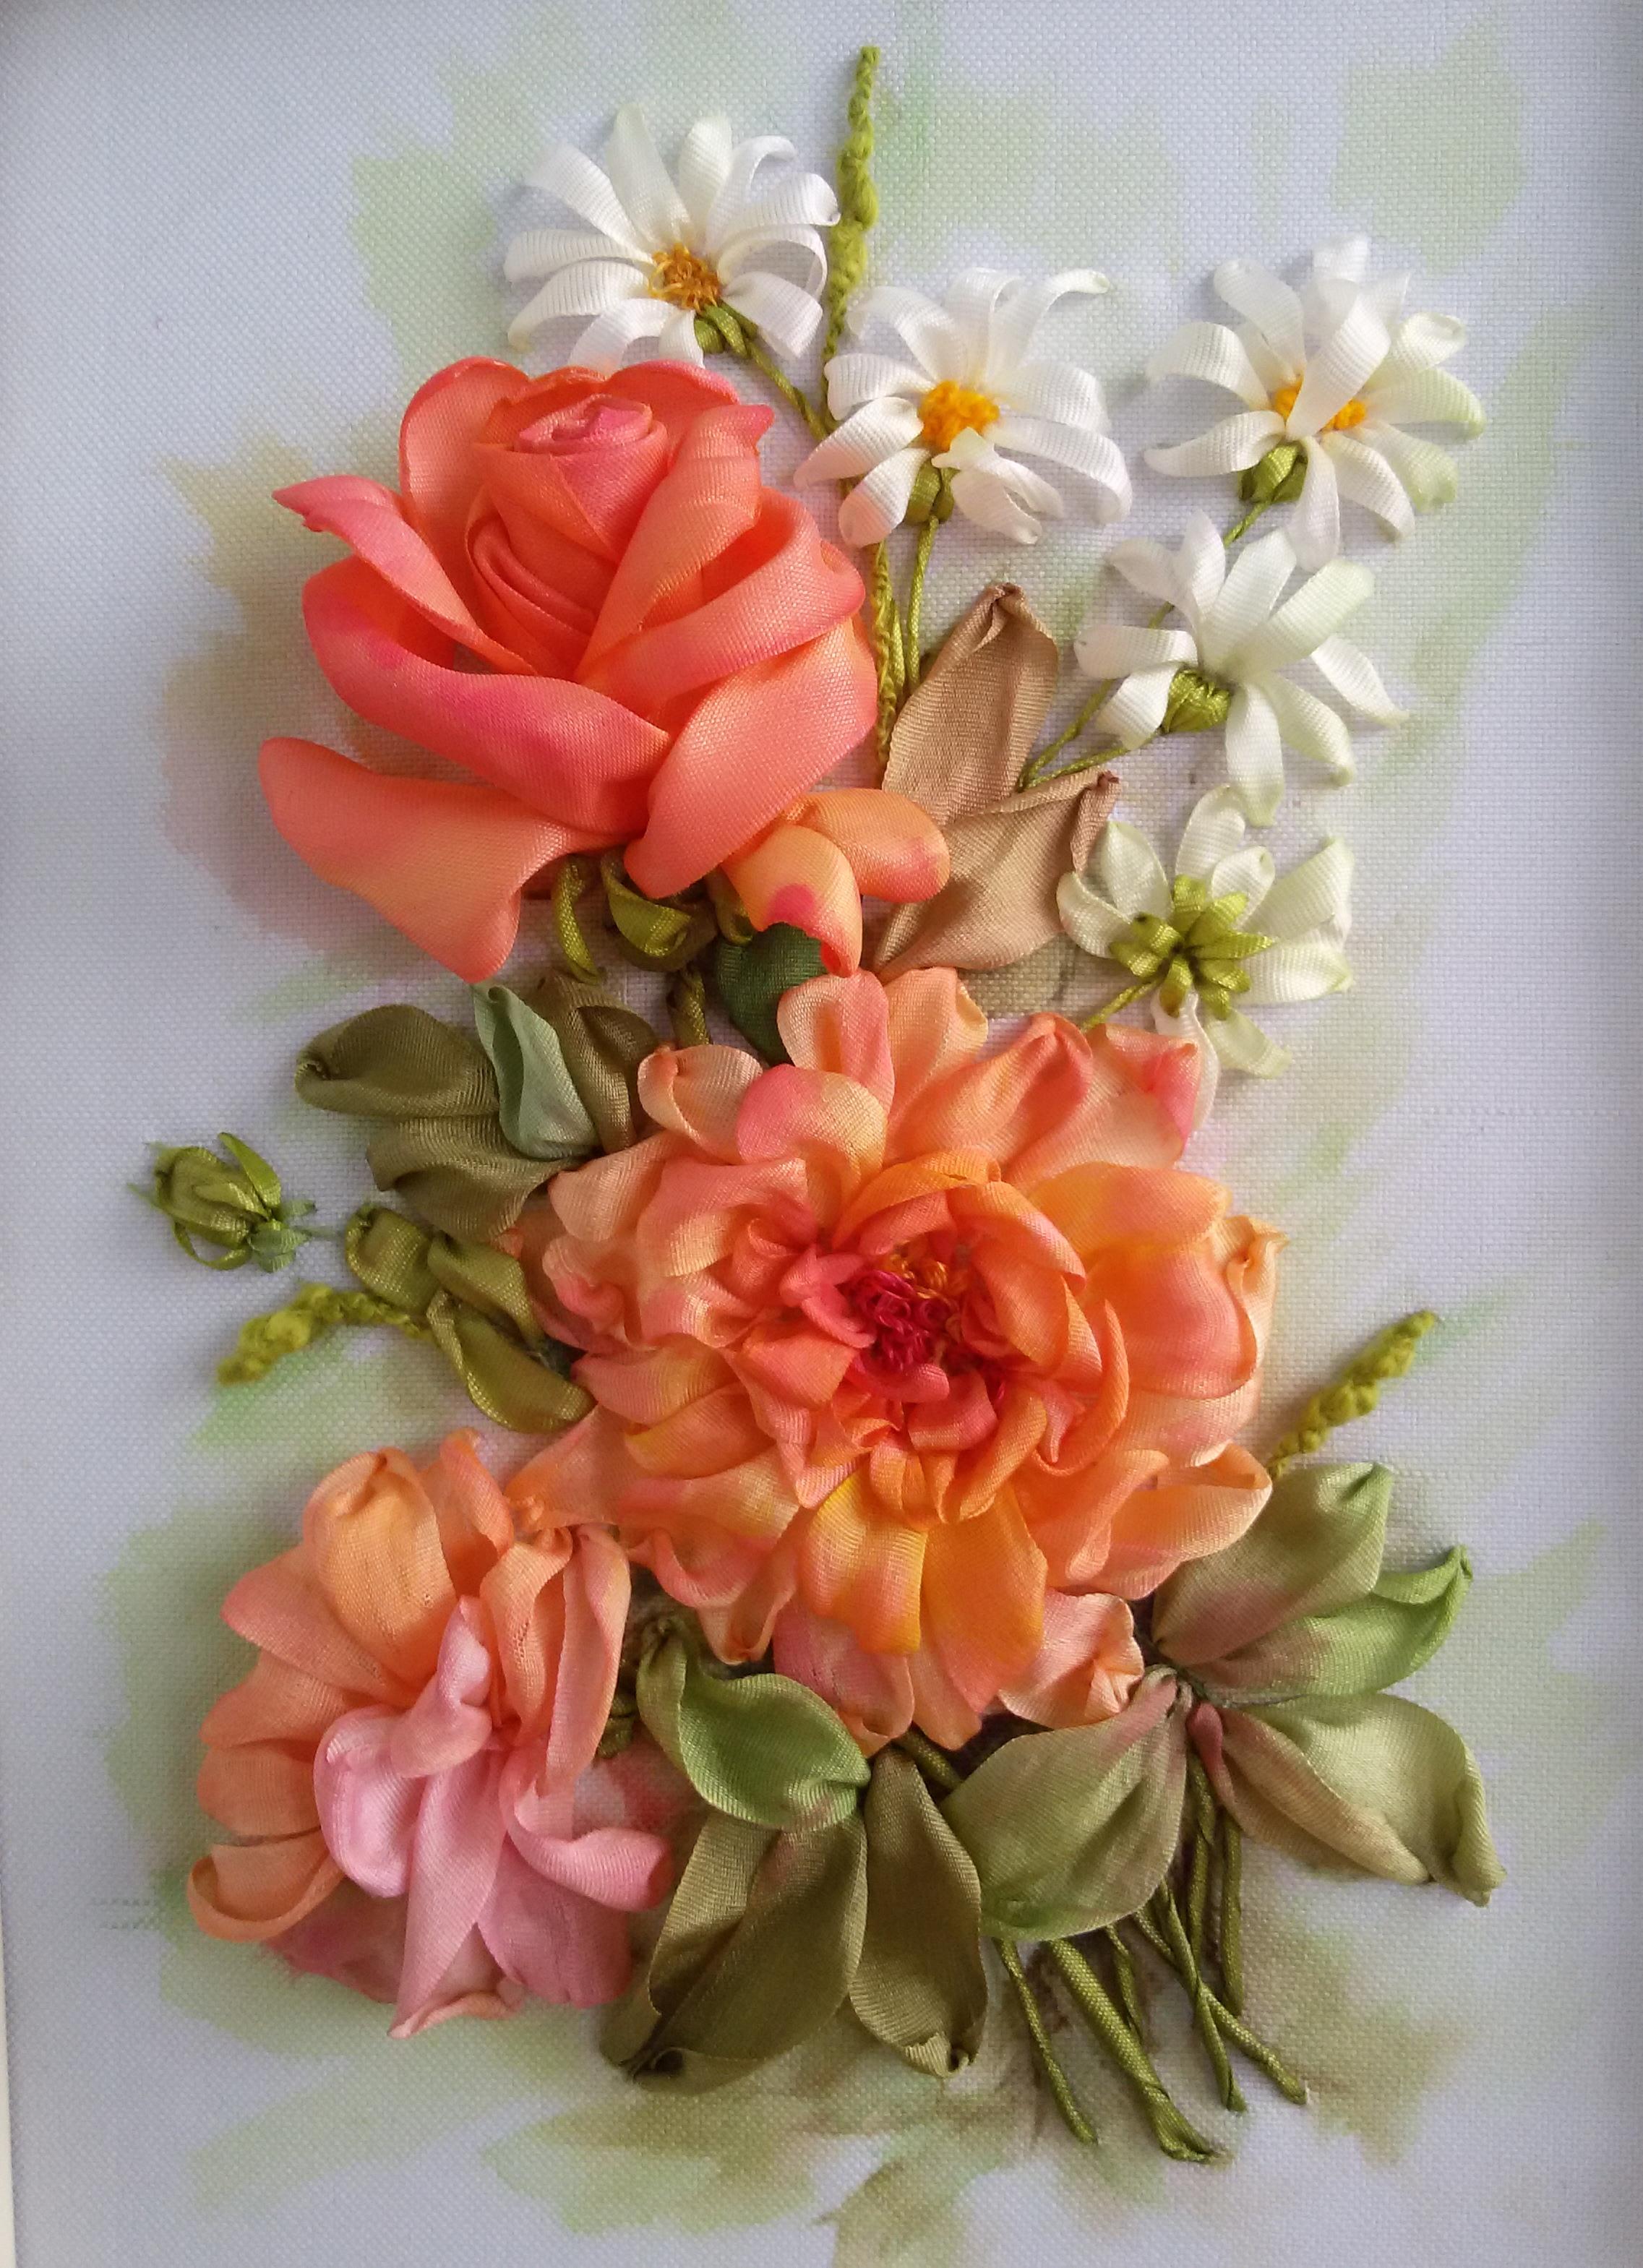 Вышивка лентами цветок шиповника